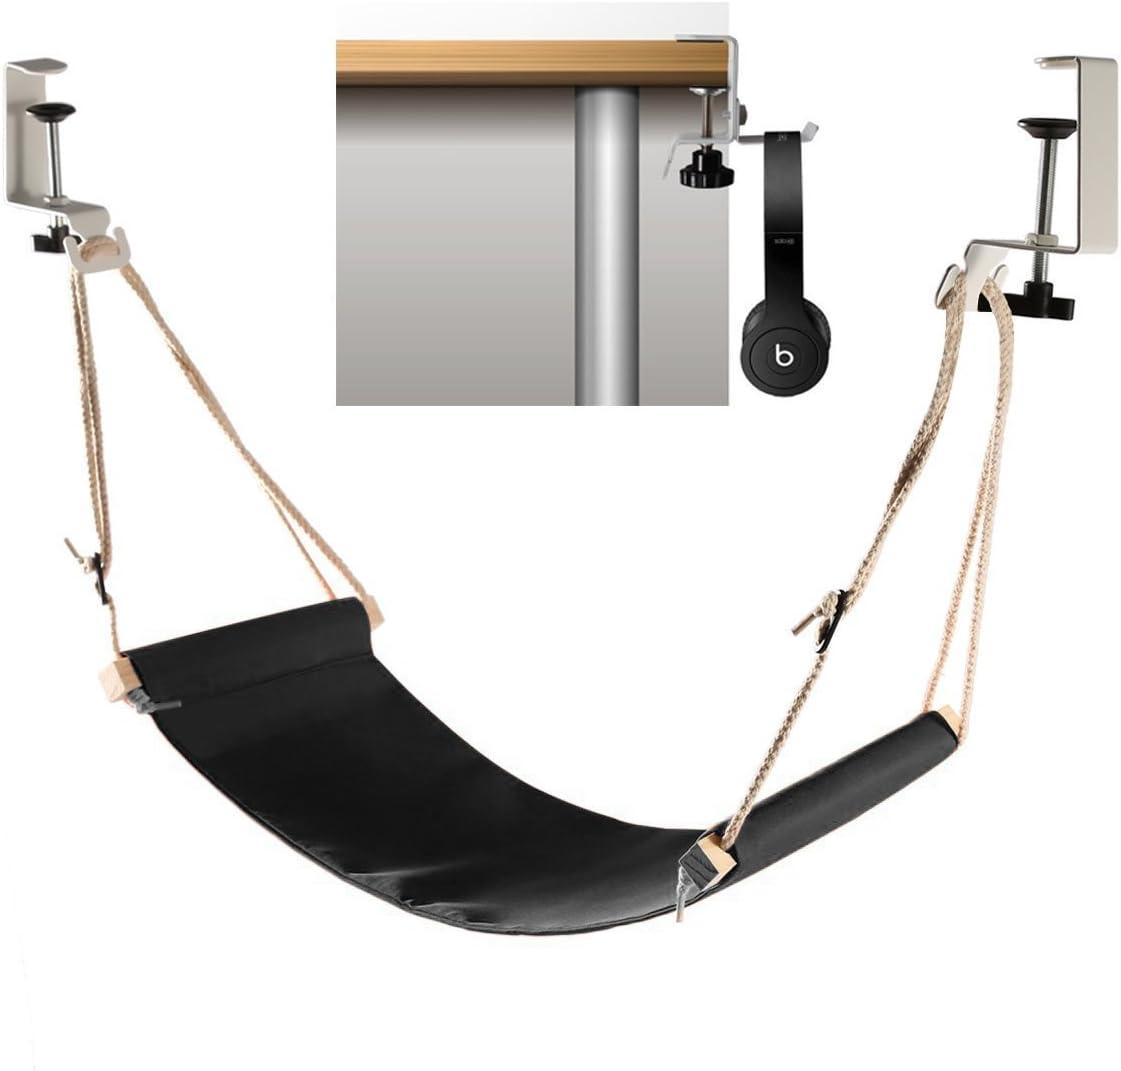 Foot hammock under desk with headphones holder Upgraded adjustable ergonomic office feet rest New Screw in rubber clamps Suitable for all desks Black